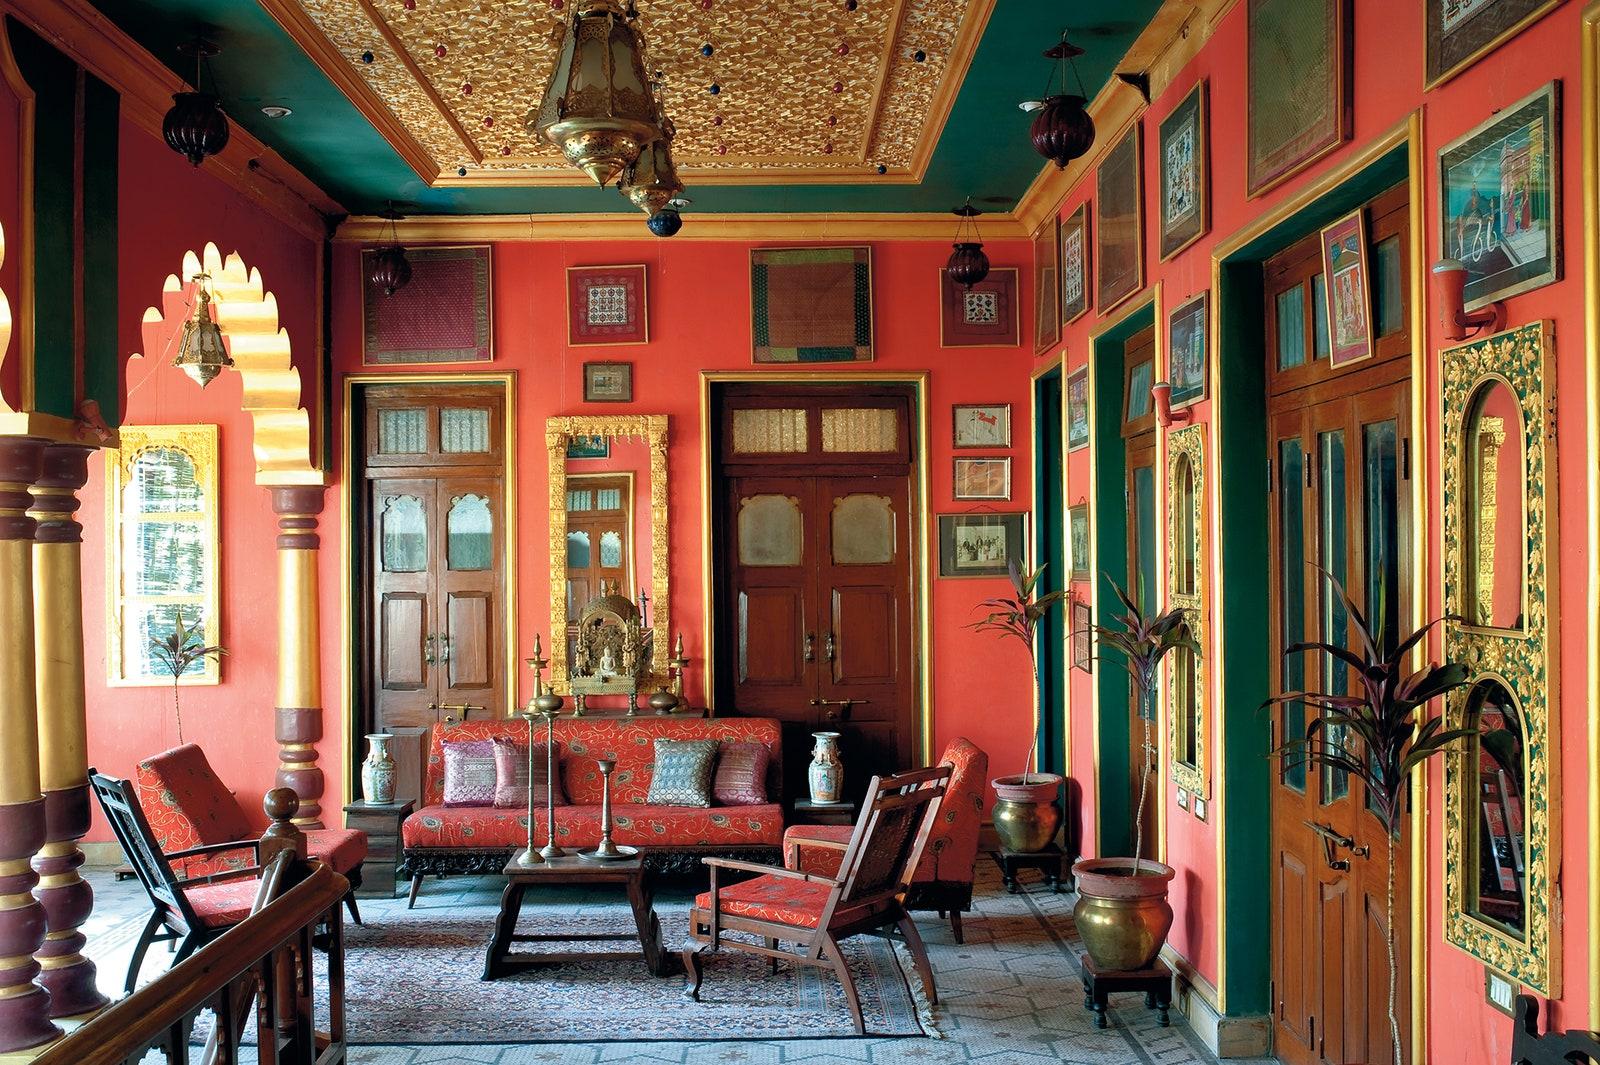 Gaya desain interior ala India – source: vogue.com